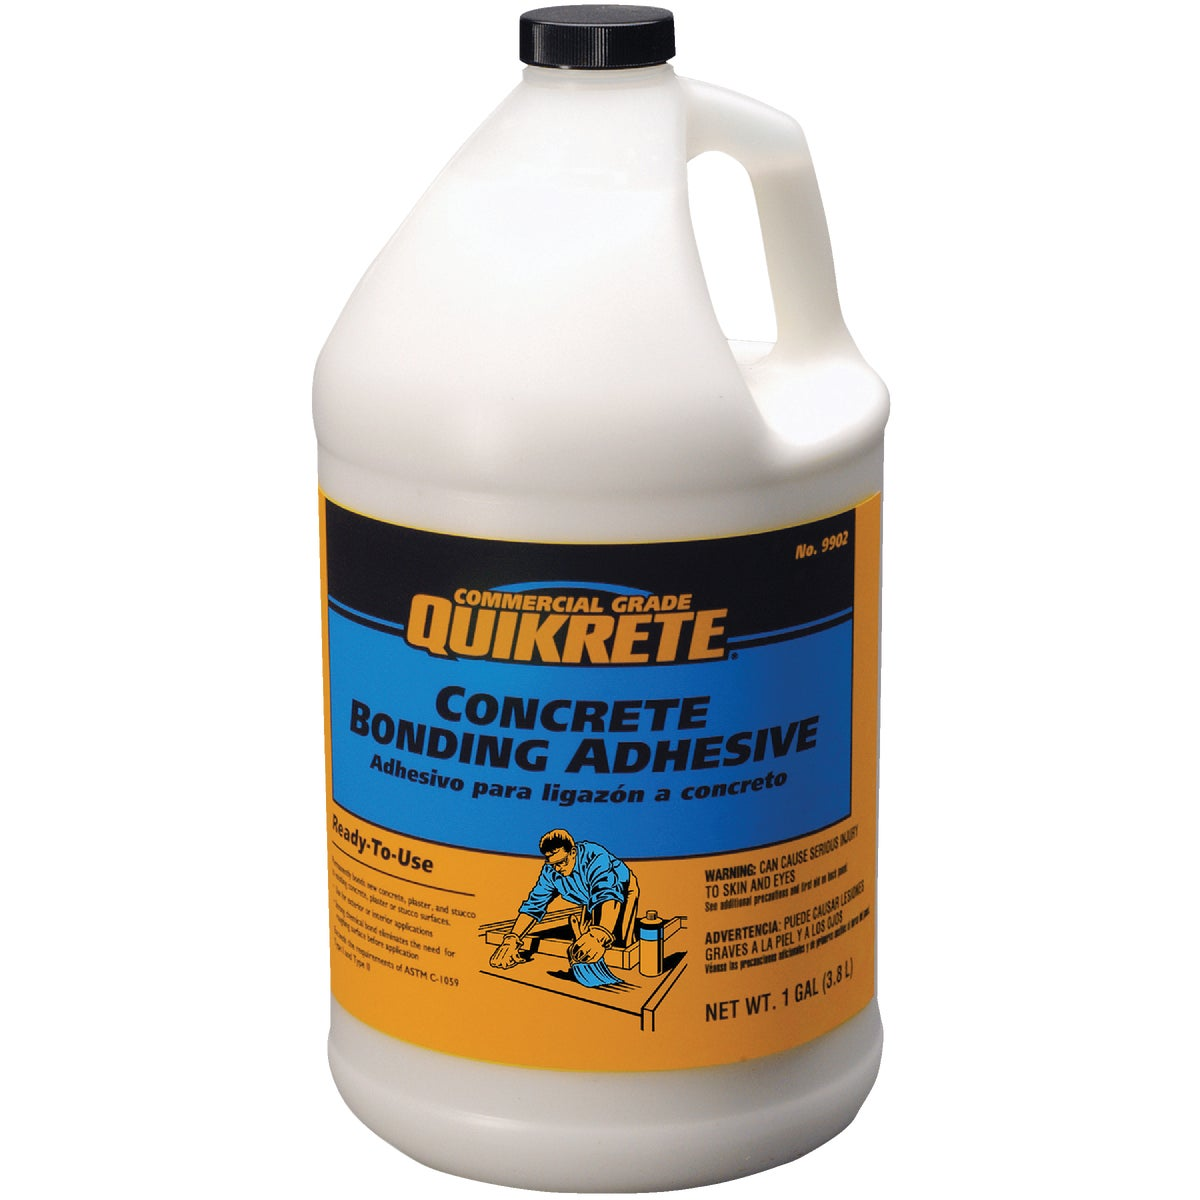 Quikrete GAL CNCRT BONDG ADHESIVE 990200